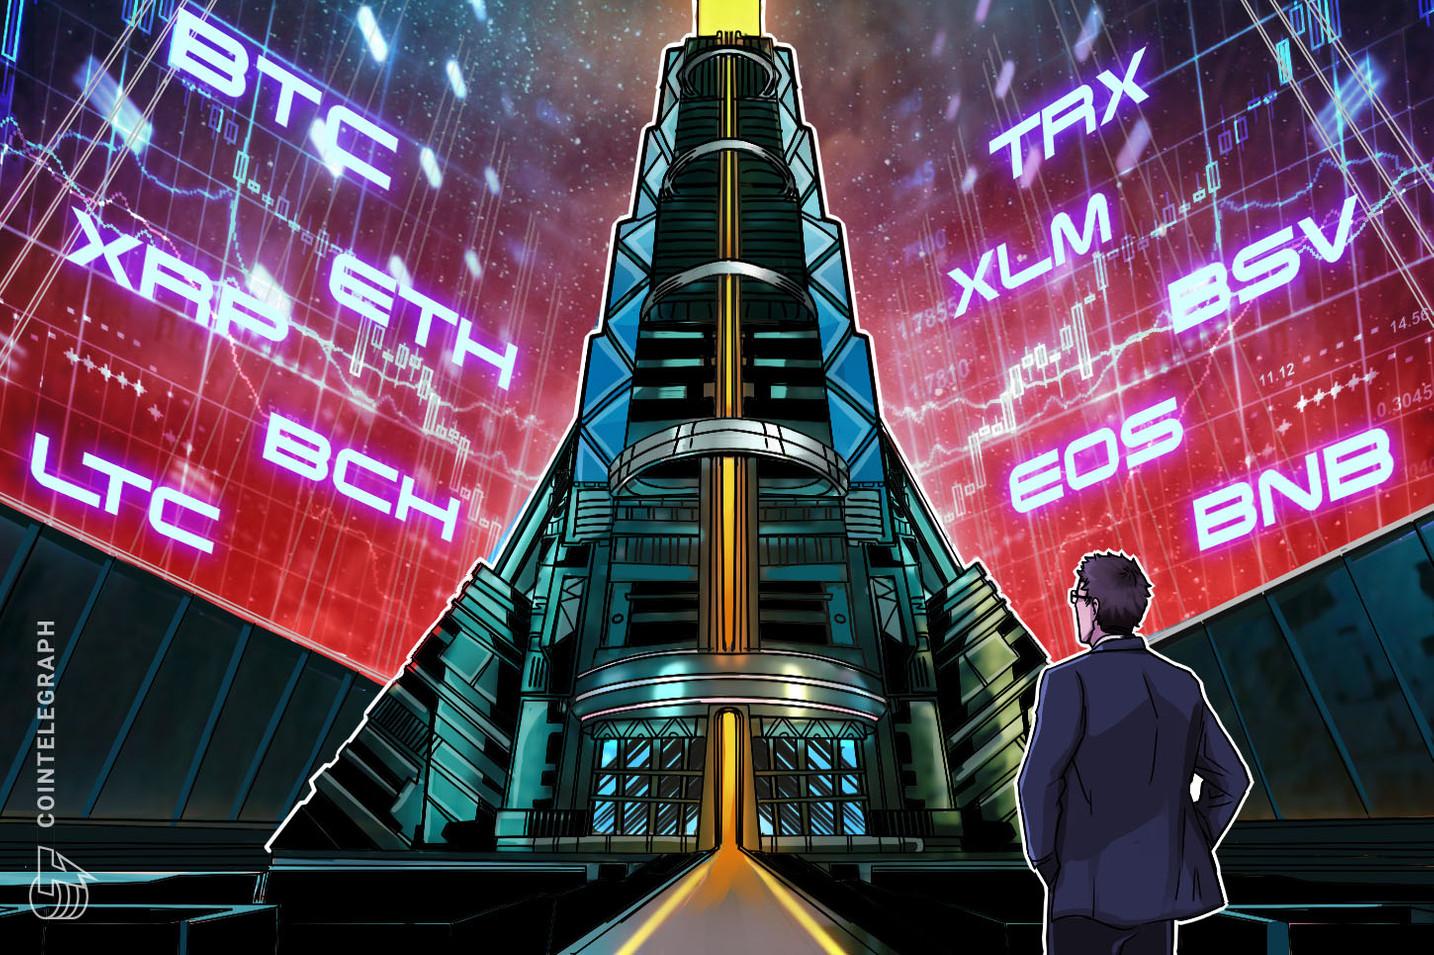 Análise de preços 23/10: BTC, ETH, XRP, BCH, LTC, EOS, BNB, BSV, XLM, TRX